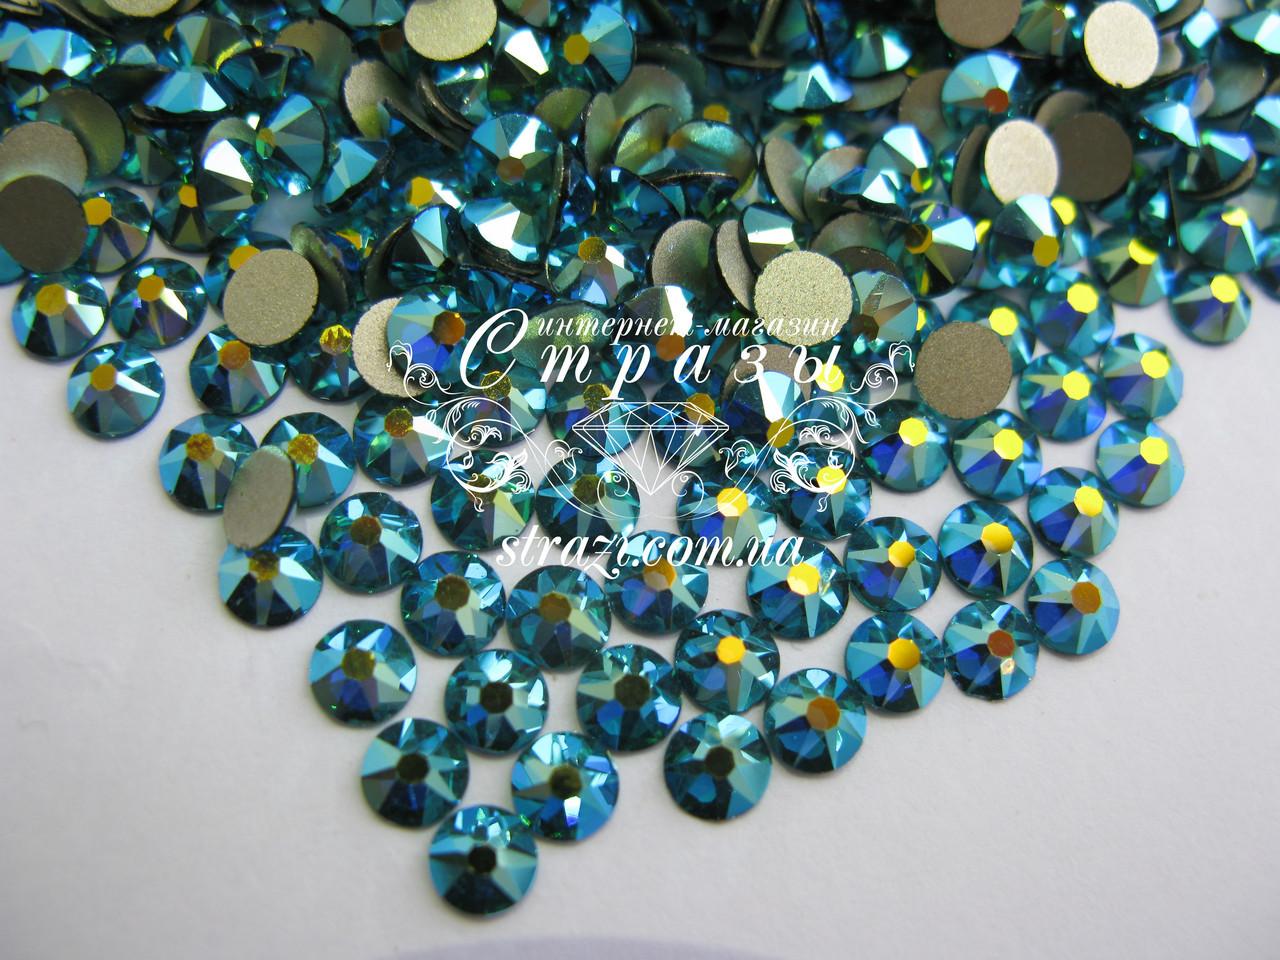 Стразы ss16 Blue Zircon AB, Xirius, NEW, 16 граней, 100шт. (4,0мм)